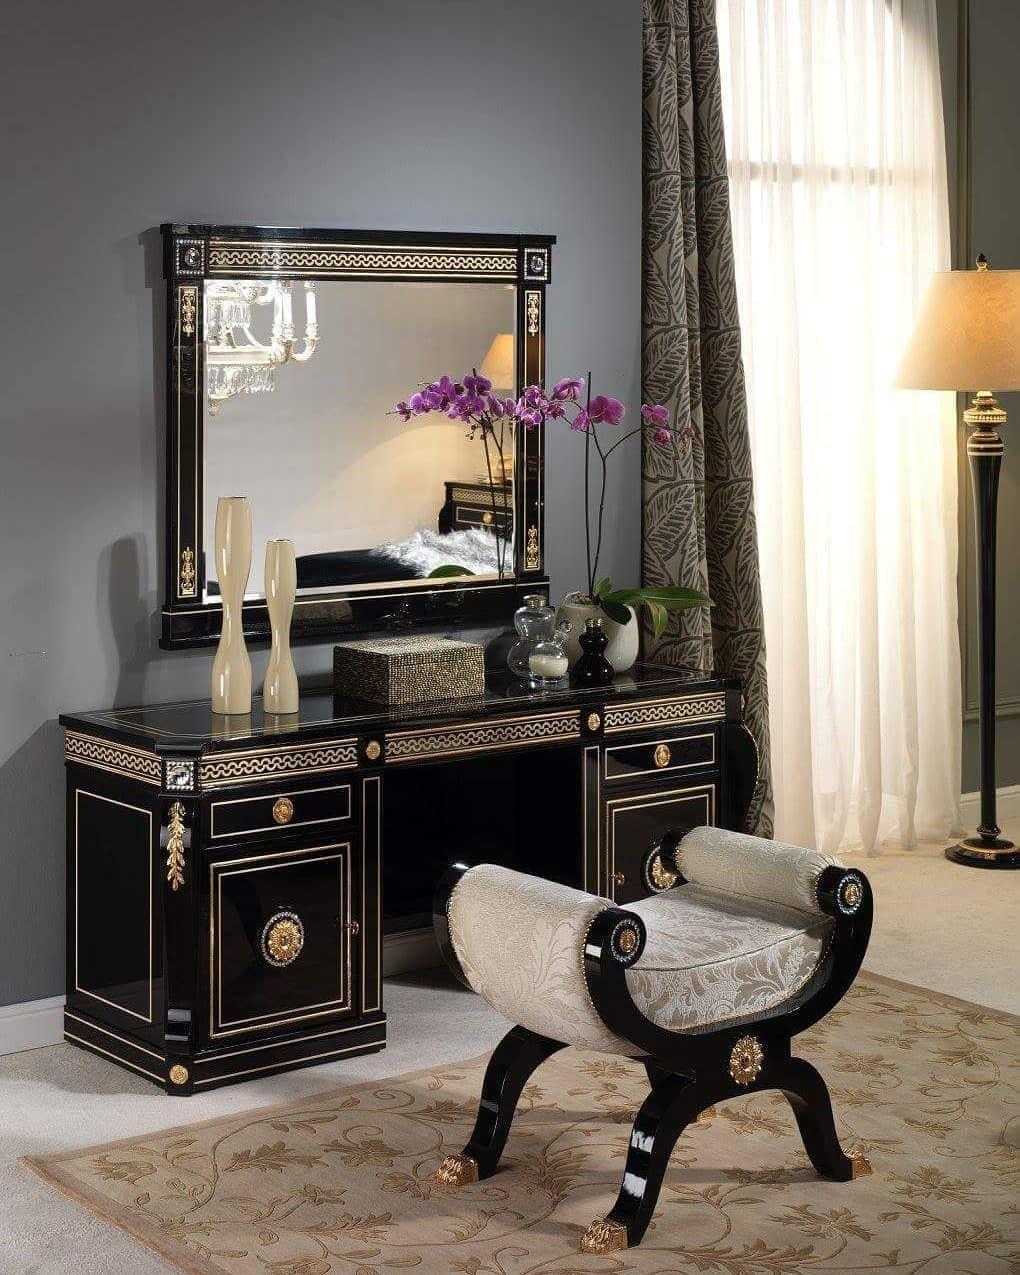 Privela Collection Neva Www Privela Com Contact Privela Com Luxurylifestyle Luxury Luxe Luxurylife Architecturedint Furniture Luxury Furniture Home Decor